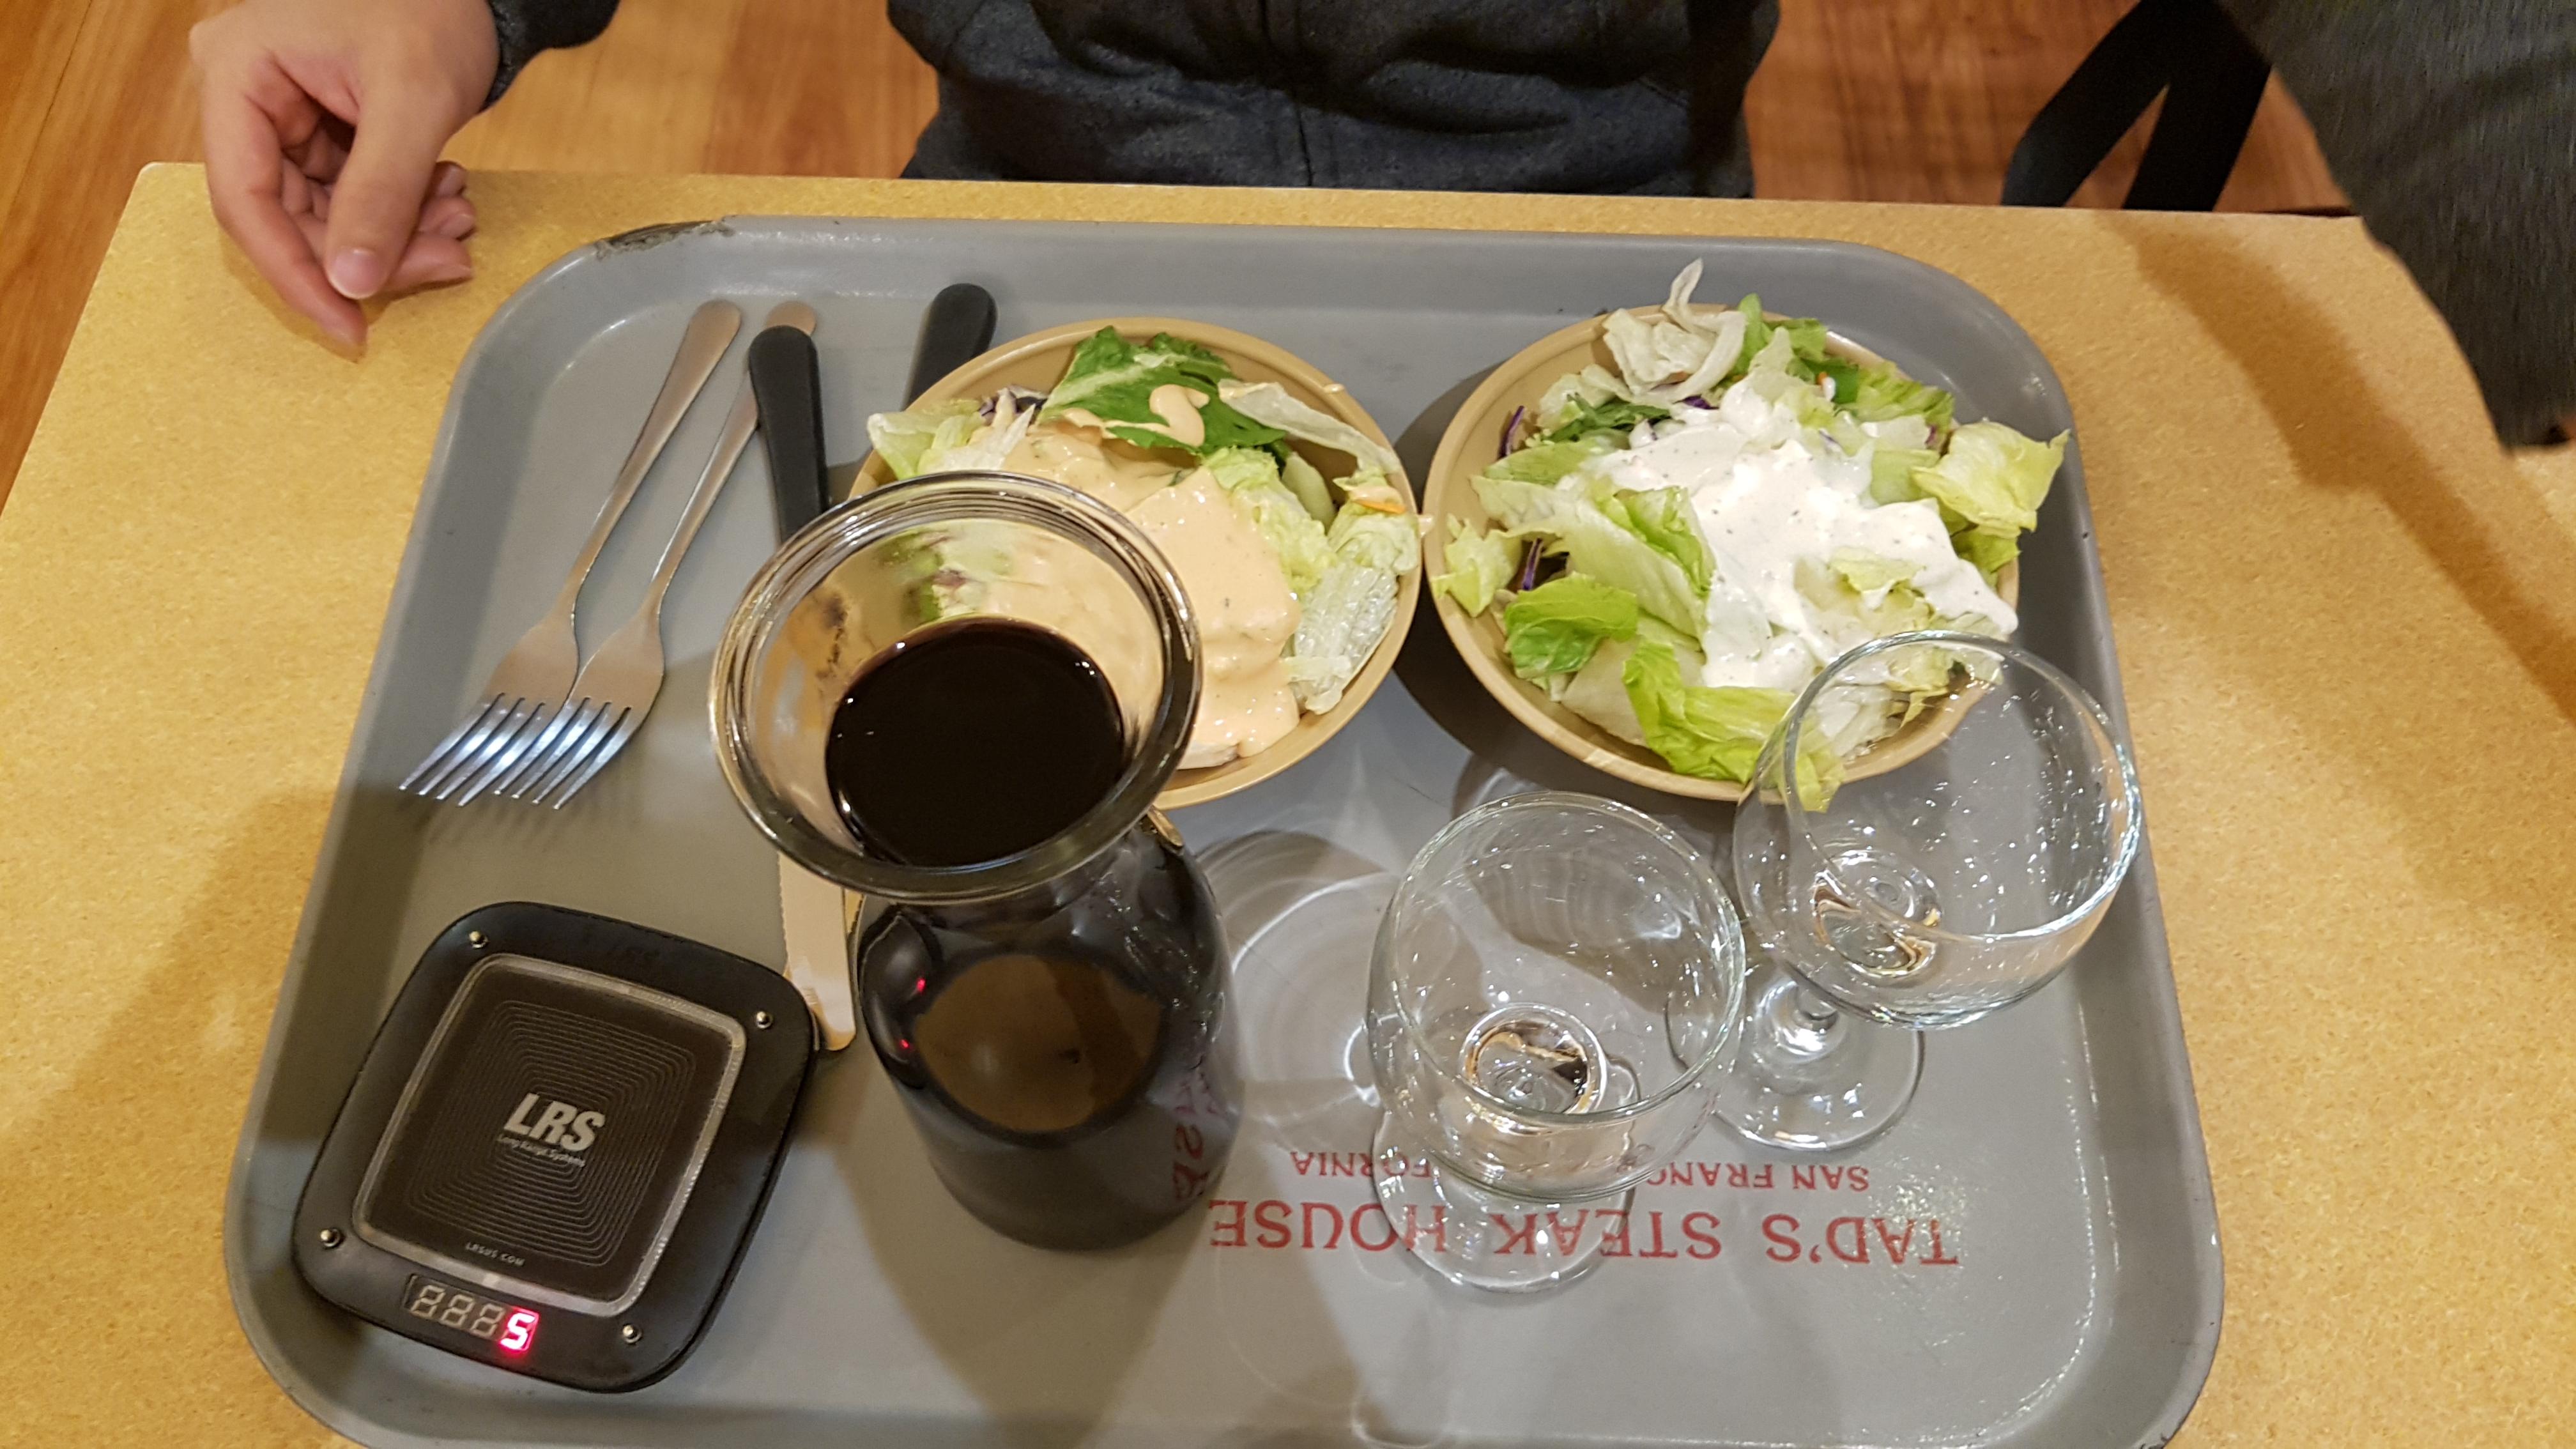 broil, carafe, carbernet sauvignon, cf, chardonnay, fresh grilled salmon, glass wine, Menu, pink, Red, Red wine, rose wine, tad's famous steak, ted's steak house, tip, T본 스테이크, WHITE, White Wine, White Zinfandel, [샌프란시스코] 첫 식사는 역시 스테이크! 테드 스테이크 ( Ted's Steak Hous ), 가격, 가성비, 감자, 고기, 관광 가이드, 구운 치킨 반마리, 굽기 정보, 달달, 드라이, 등심, 레드 와인, 렌치, 로코코, 마늘빵, 메뉴, 메뉴판, 미국 팁, 미디엄 레어, 박스, 변형, 빵, 사우전드 아일랜드, 색상, 샌프란시스코 팁, 샐러드, 샤르도네, 셀프 서비스, 소스, 술, 스테이크, 시차적응, 신선한 구운 연어, 안심, 양조, 연어 구이, 영수증, 오븐, 오븐구이, 와알못, 와인, 와인 종류, 와인 포도종, 유니언 스퀘어, 유명한 특수부위 스테이크, 육즙, 음료, 음식점 팁, 이용 편리, 입문용, 입문용 와인, 장점, 전기구이, 주, 주문, 진 판델, 진동벨, 진짜별, 질긴 고기, 첫 식사, 체인점, 치킨, 카베르네 소비뇽, 캘리포니아, 캘리포니아 주, 커레이프, 테드 스테이크 하우스, 테즈 스테이크, 트, 특수 부위, 포장, 피곤, 핑크색, 화이트 진판델